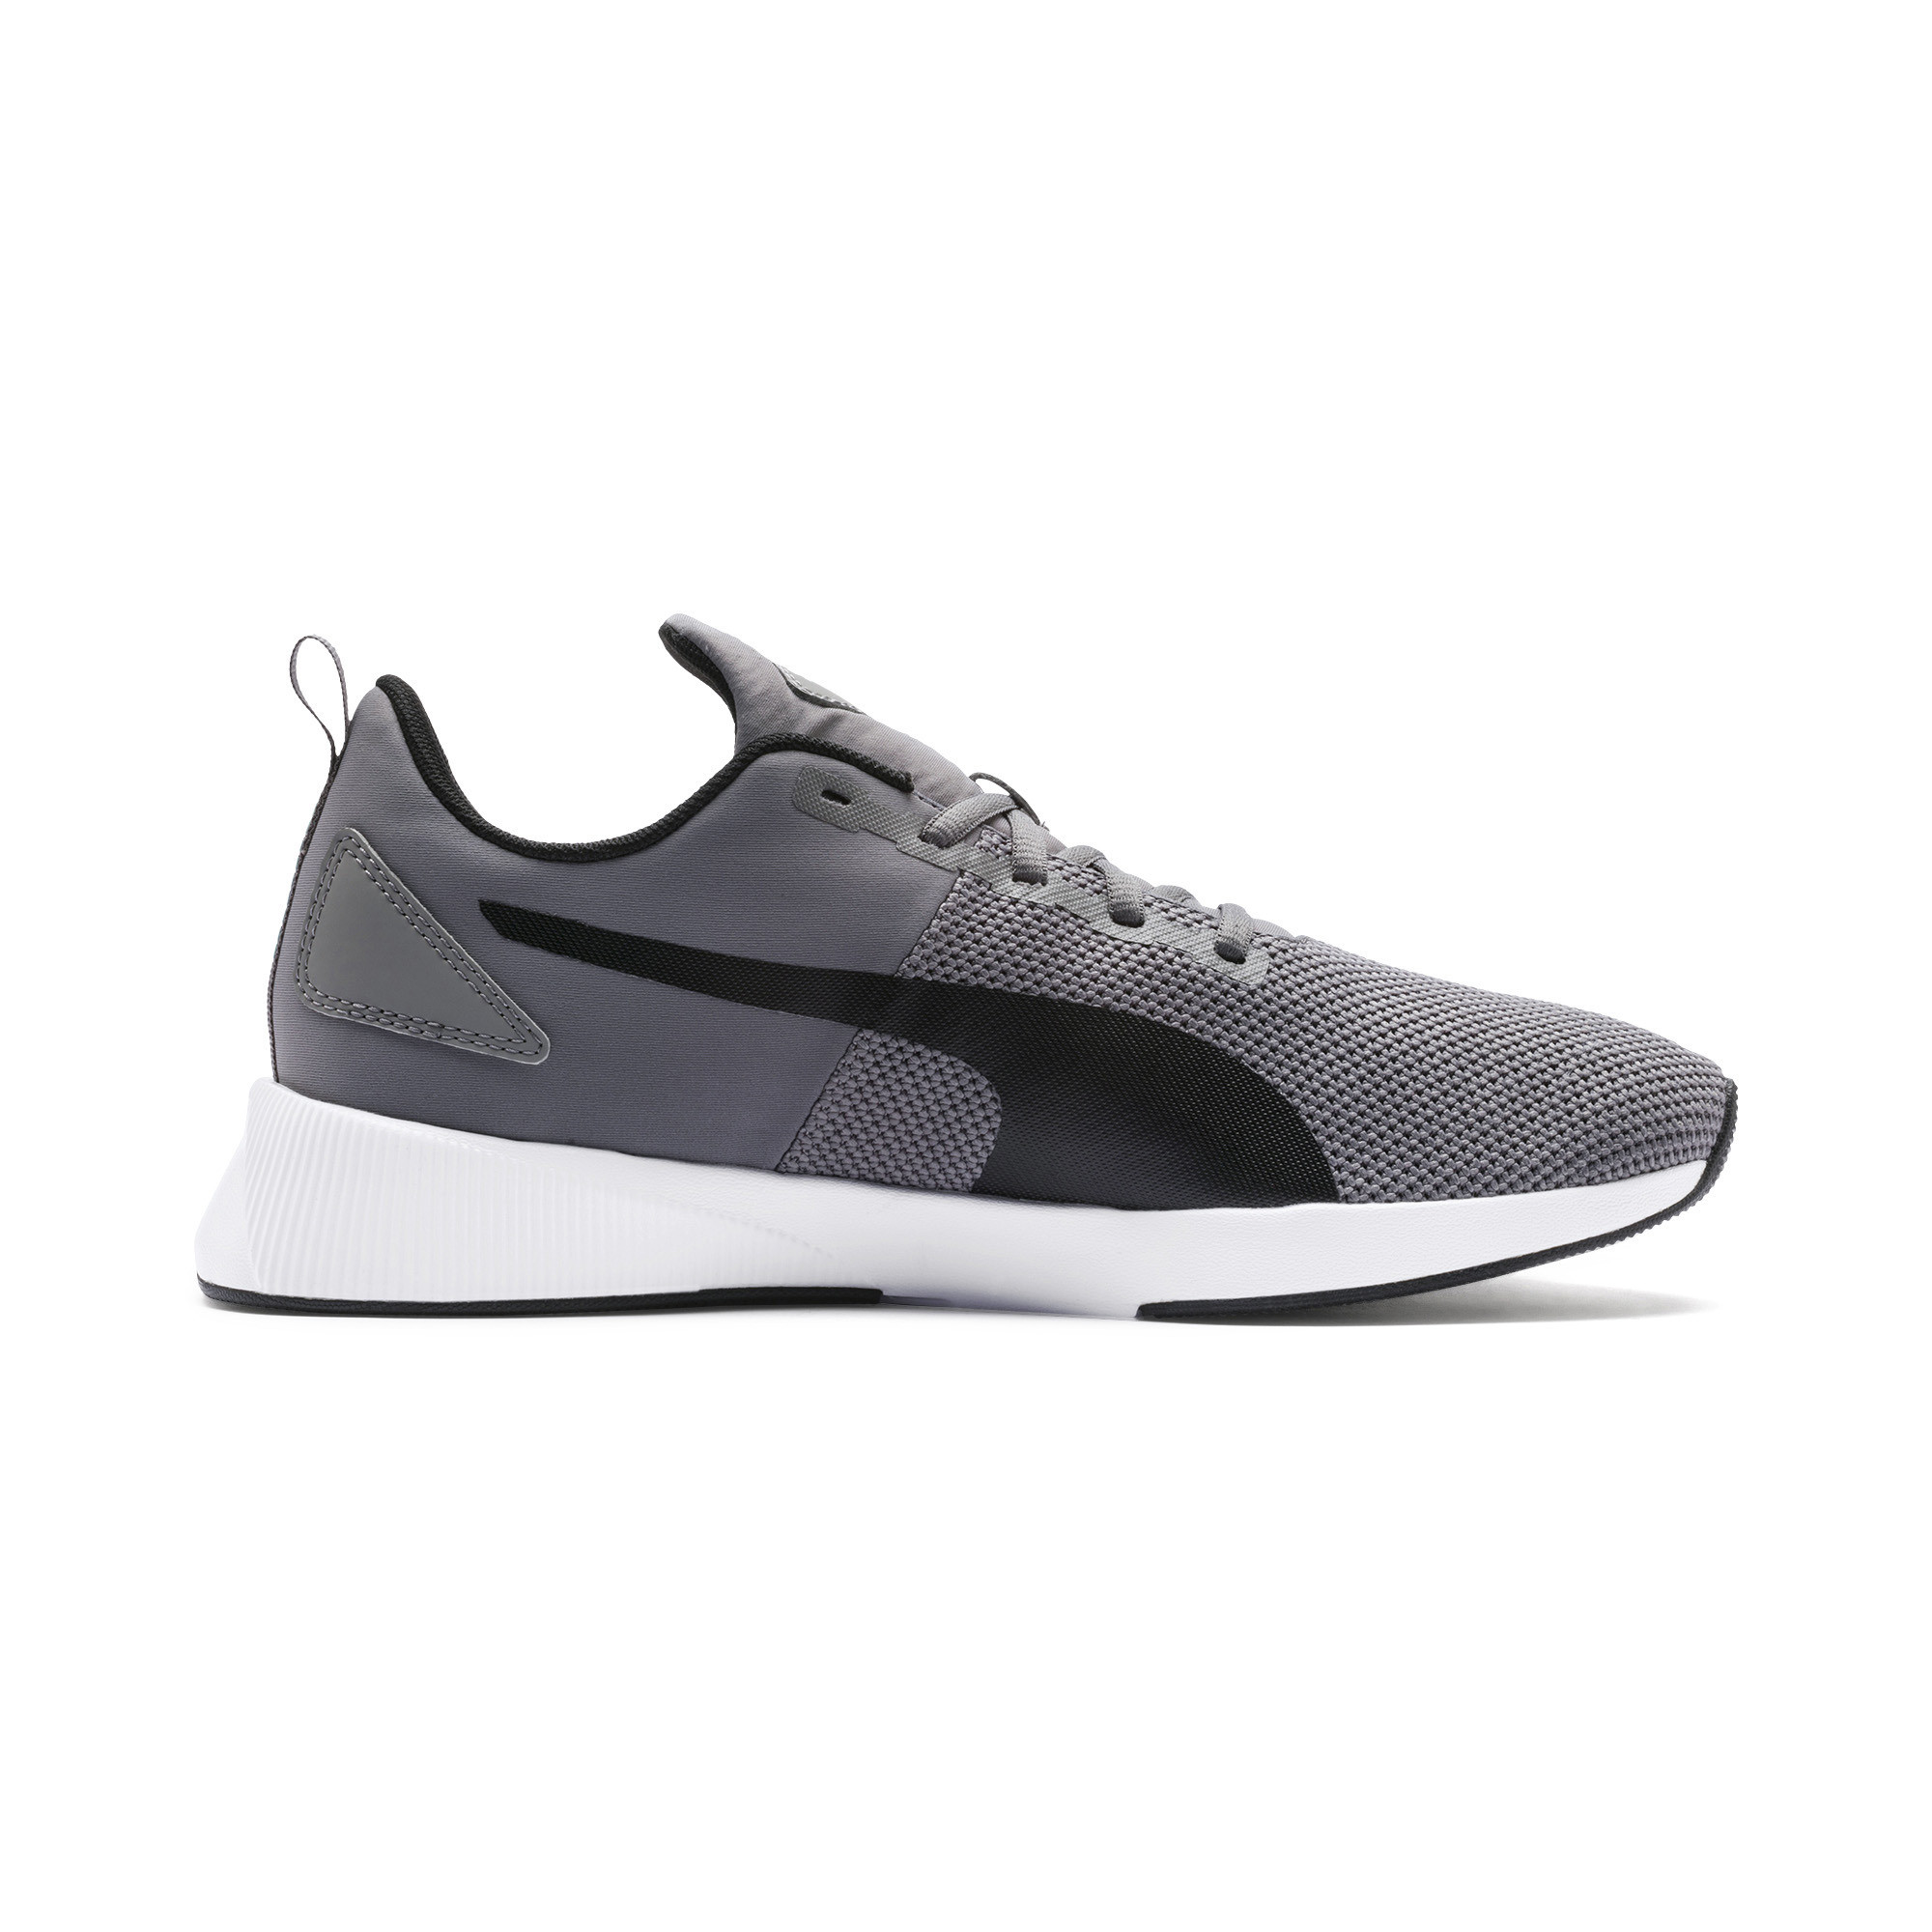 PUMA-Flyer-Runner-Running-Shoes-Mens-Shoe-Running thumbnail 19